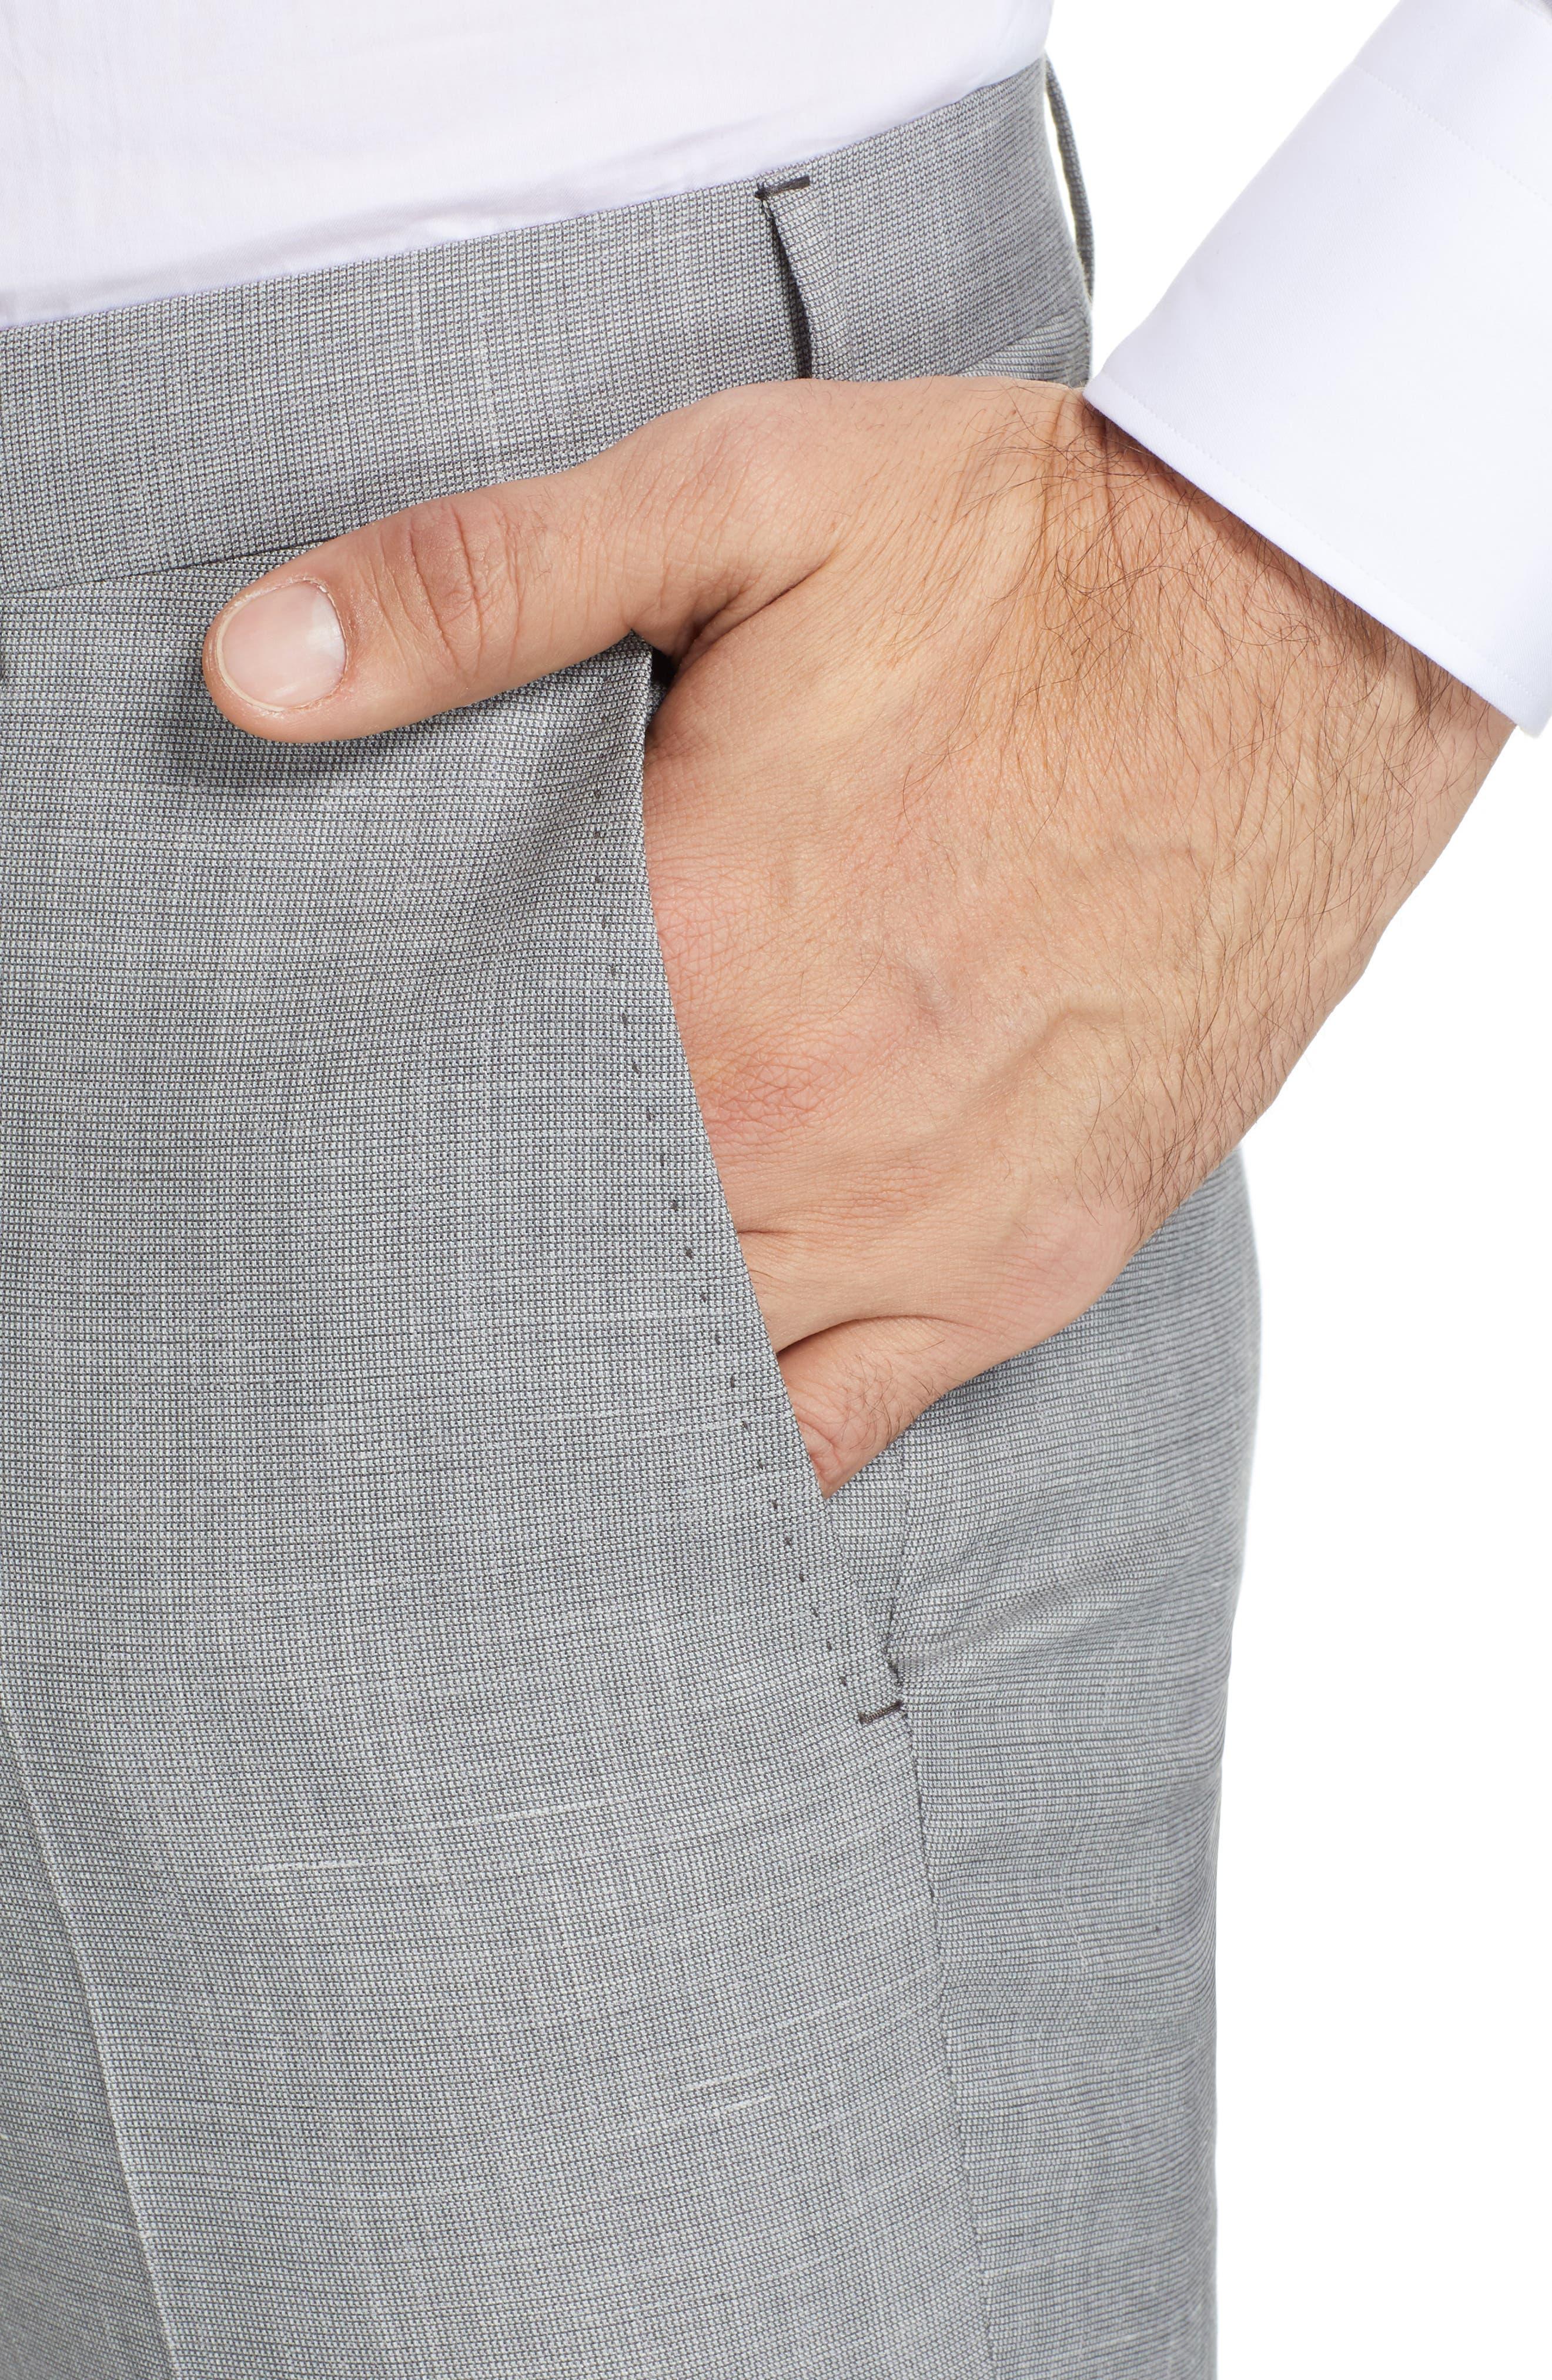 ERMENEGILDO ZEGNA, Trofeo Flat Front Solid Wool Blend Trousers, Alternate thumbnail 4, color, LIGHT GREY